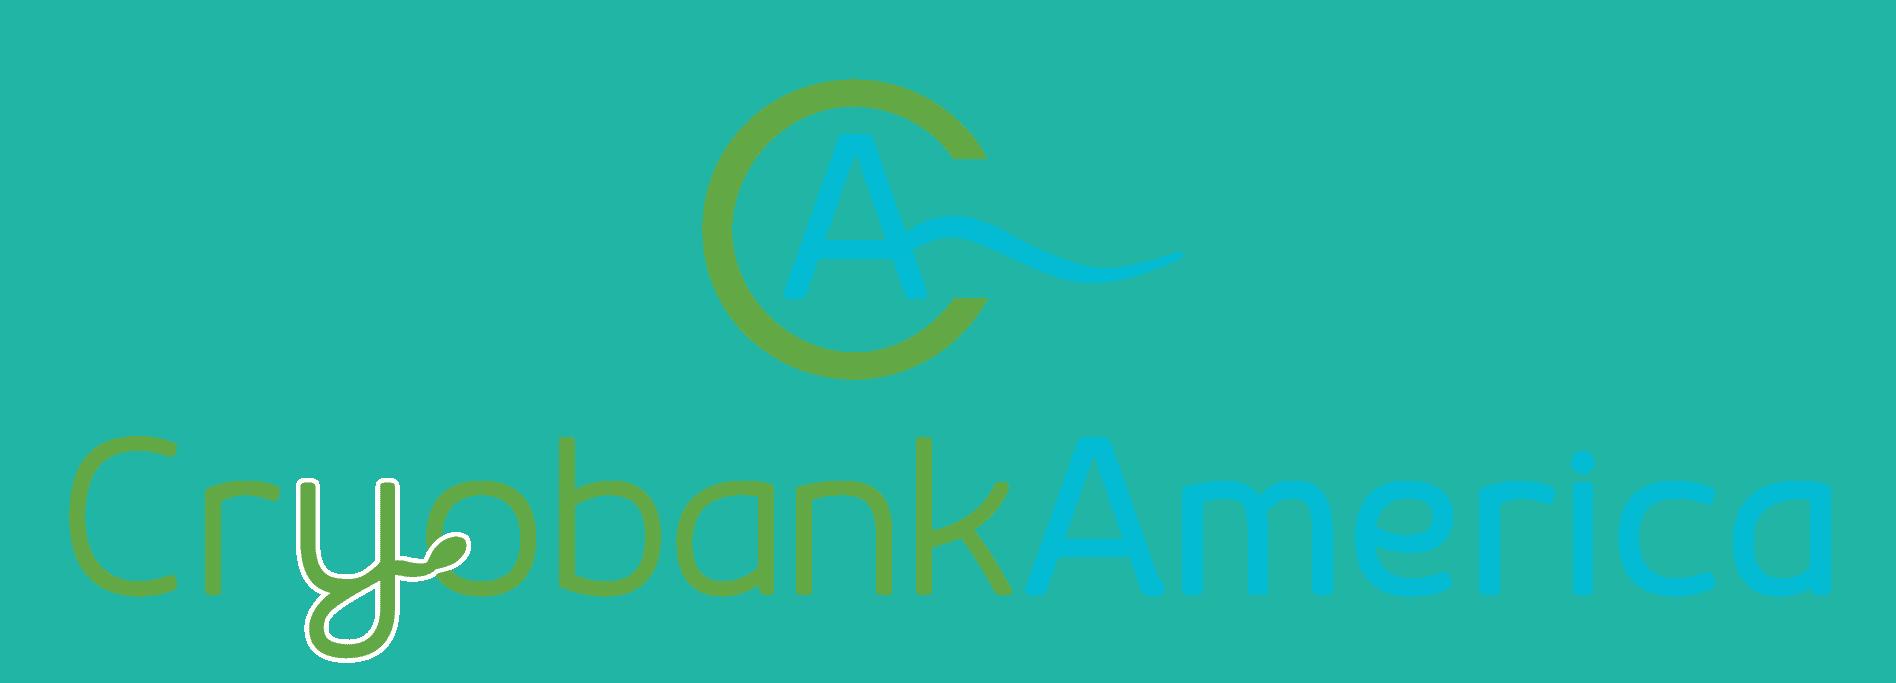 Cryobank America